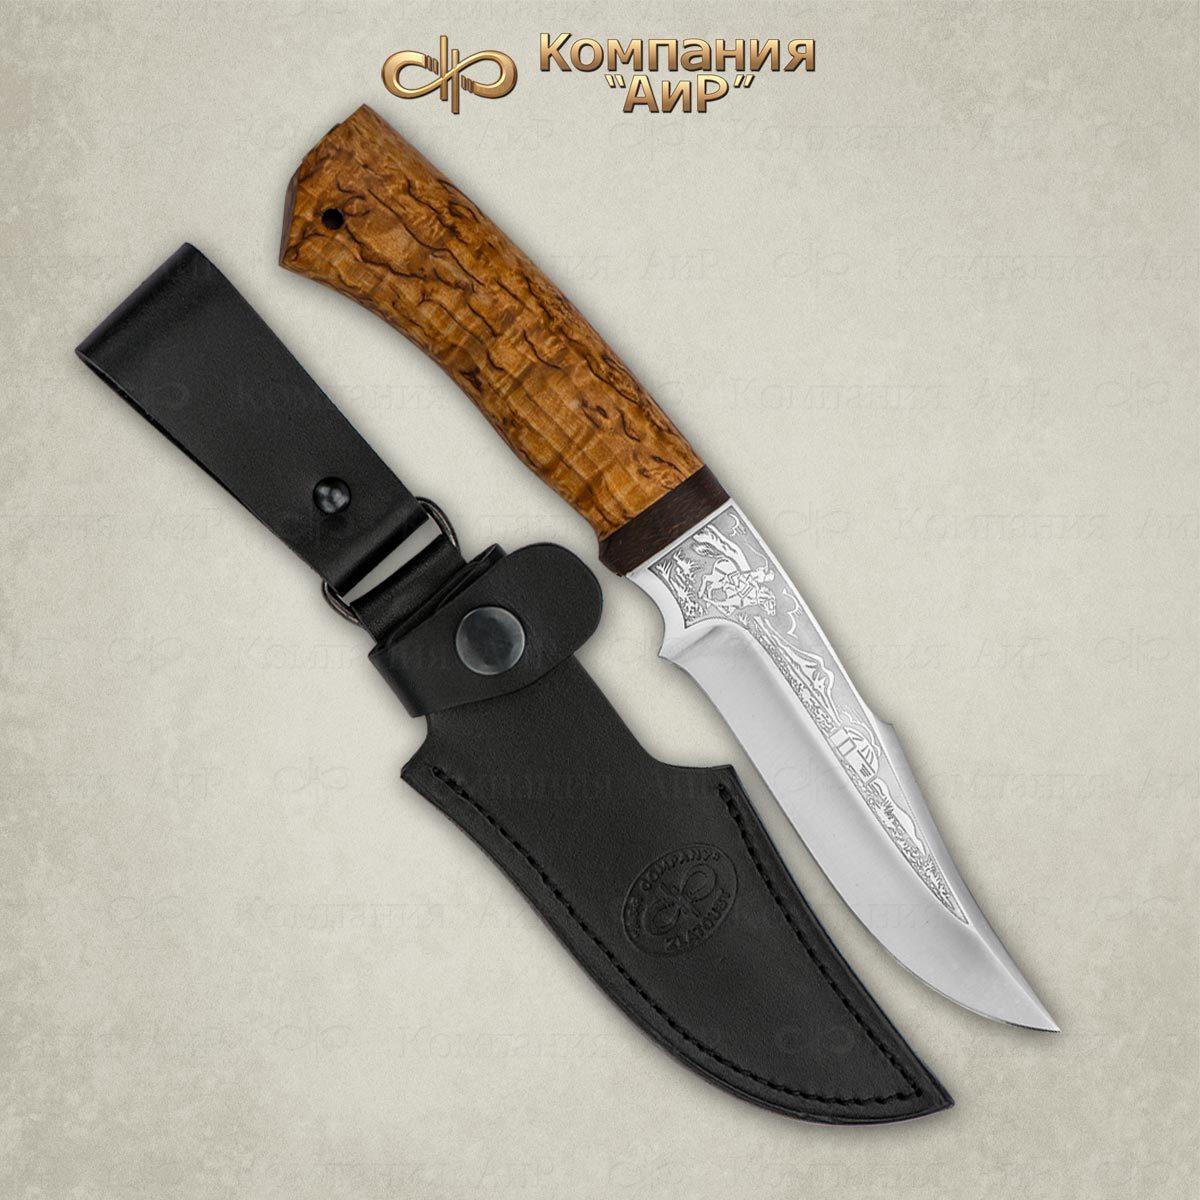 Нож АиР Хазар, сталь 110х18 М-ШД, рукоять карельская береза нож бекас карельская береза 110х18 м шд